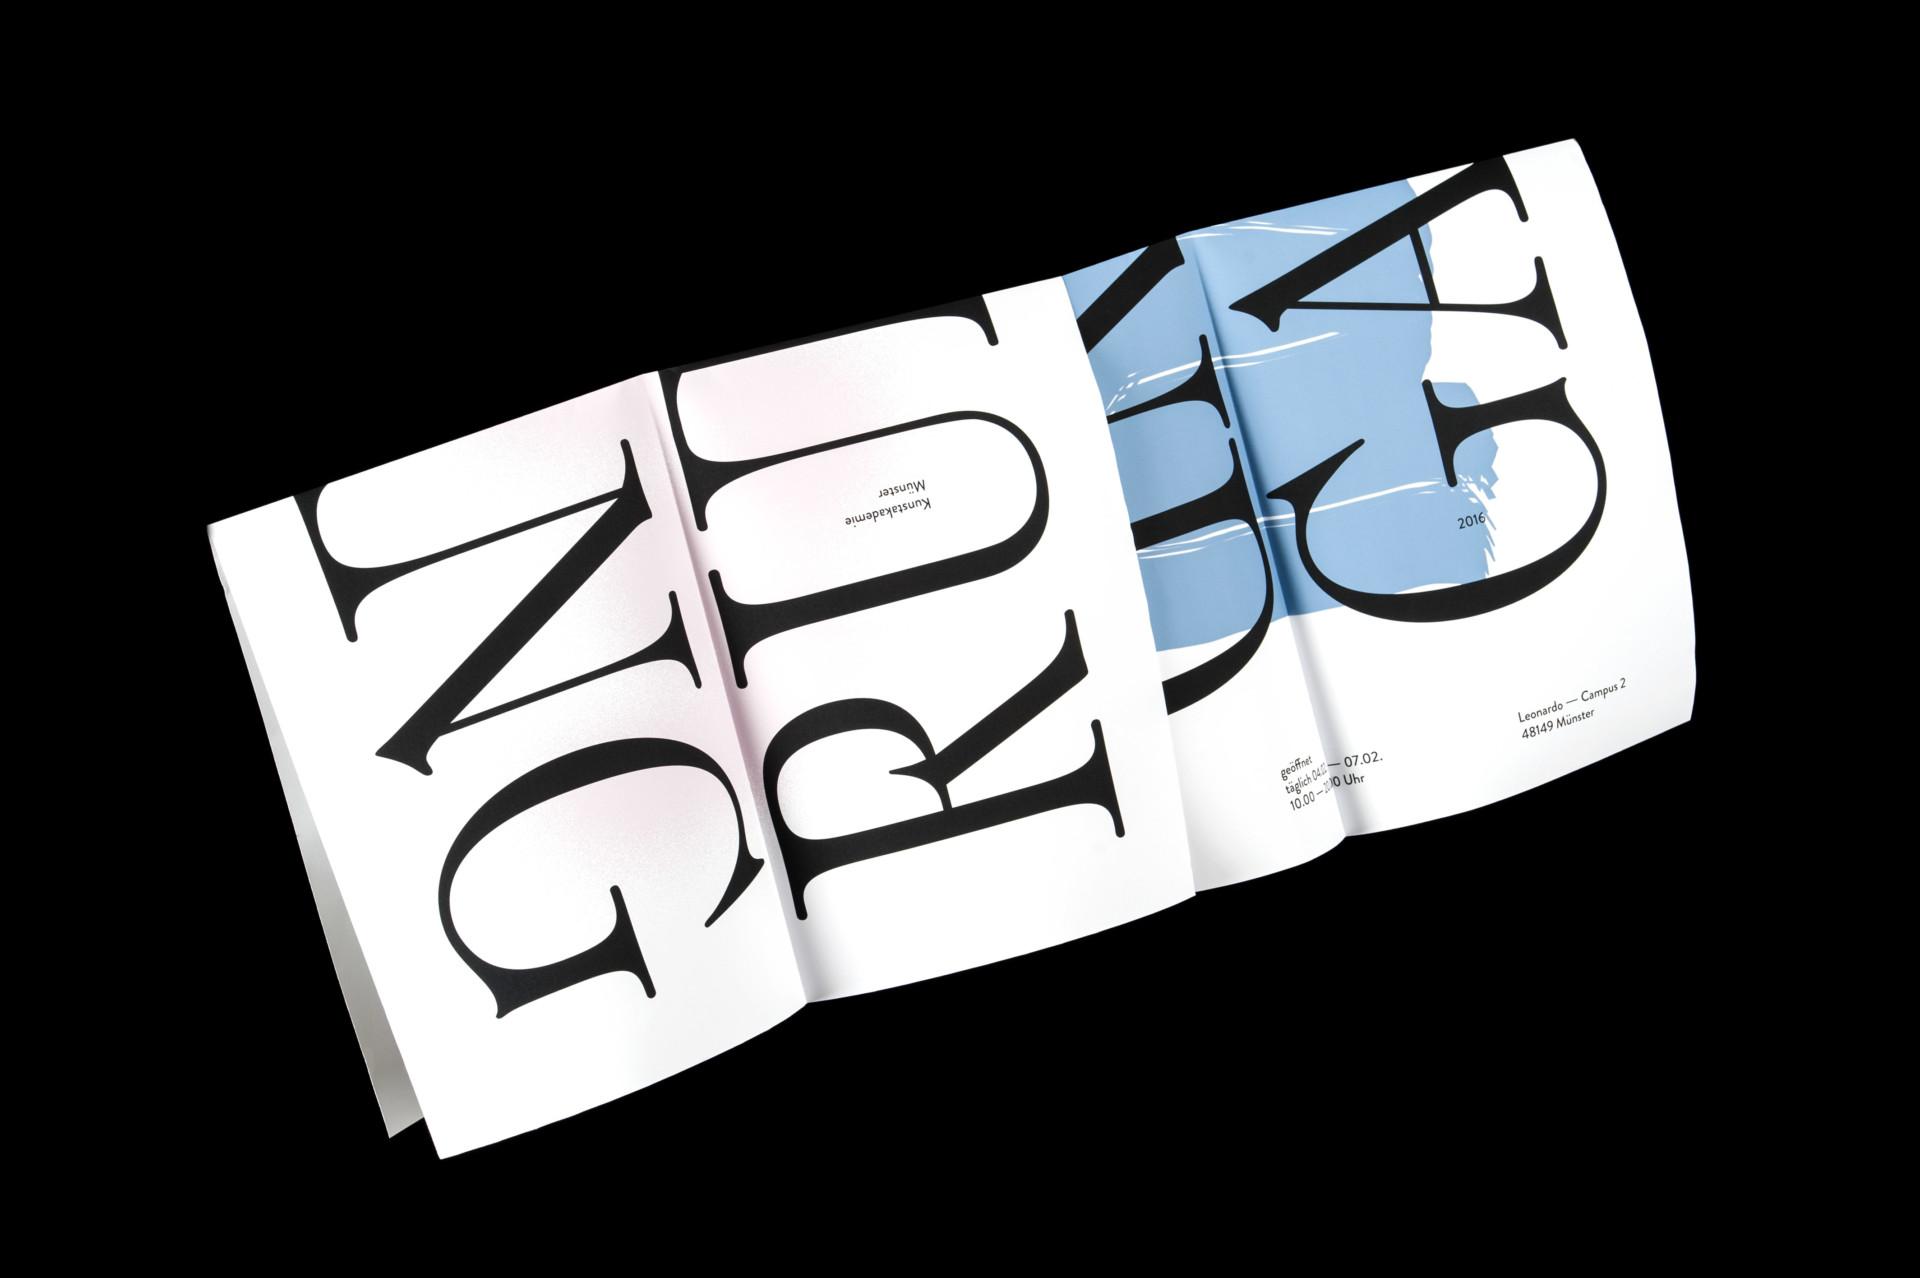 Amélie Graef – Graphicdesign & Art Direction Rundgang 2016